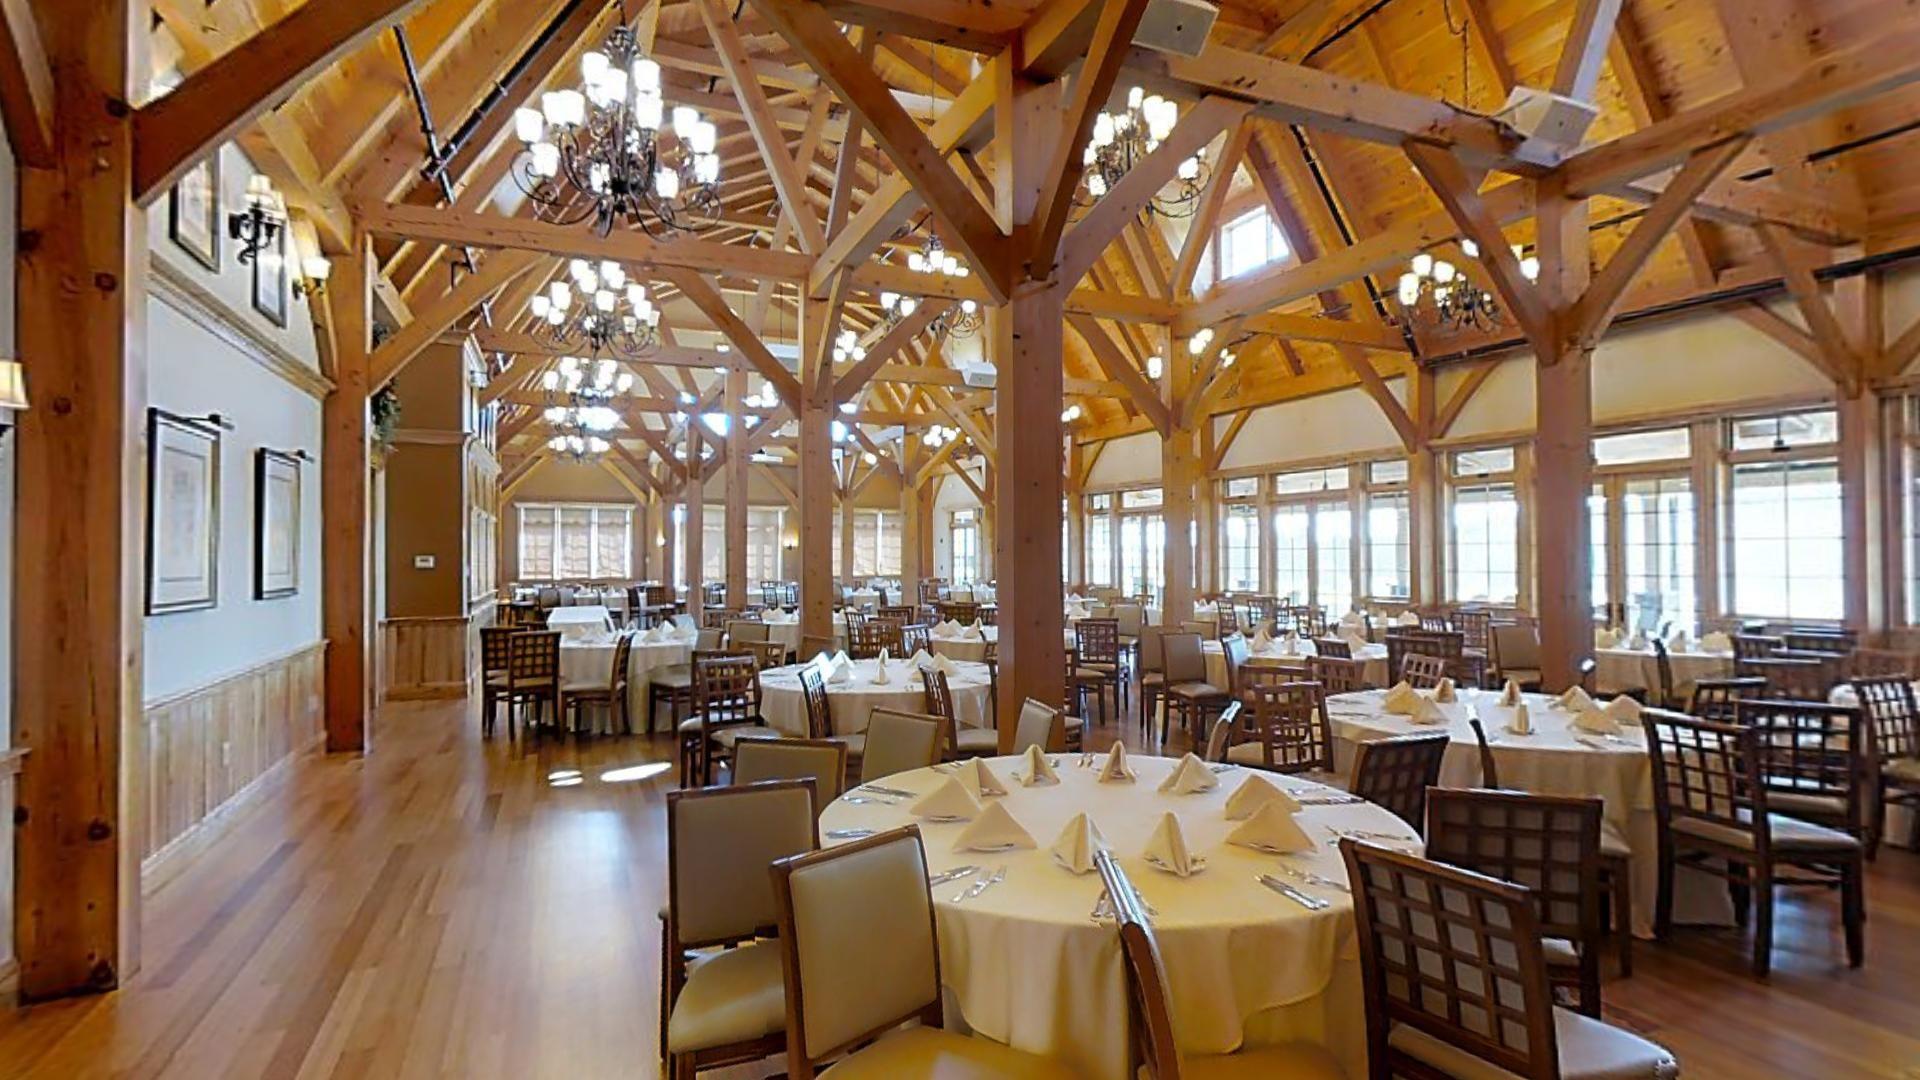 The Red Barn Wedding Venue | Barn wedding venue, Rustic ...